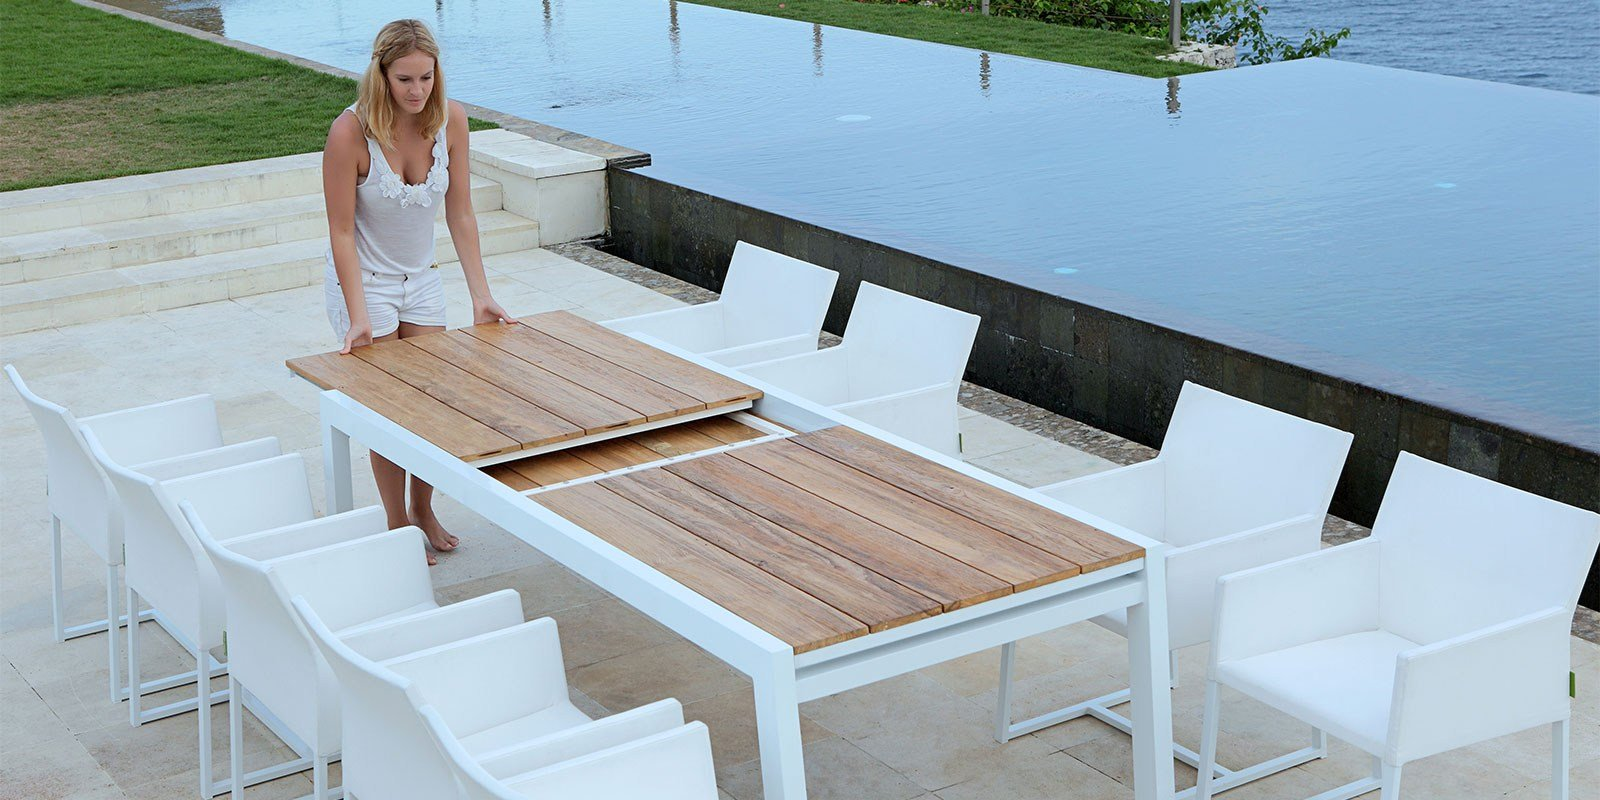 Tavoli estensibili in legno tavoli quadrati allungabili for Tavoli allungabili